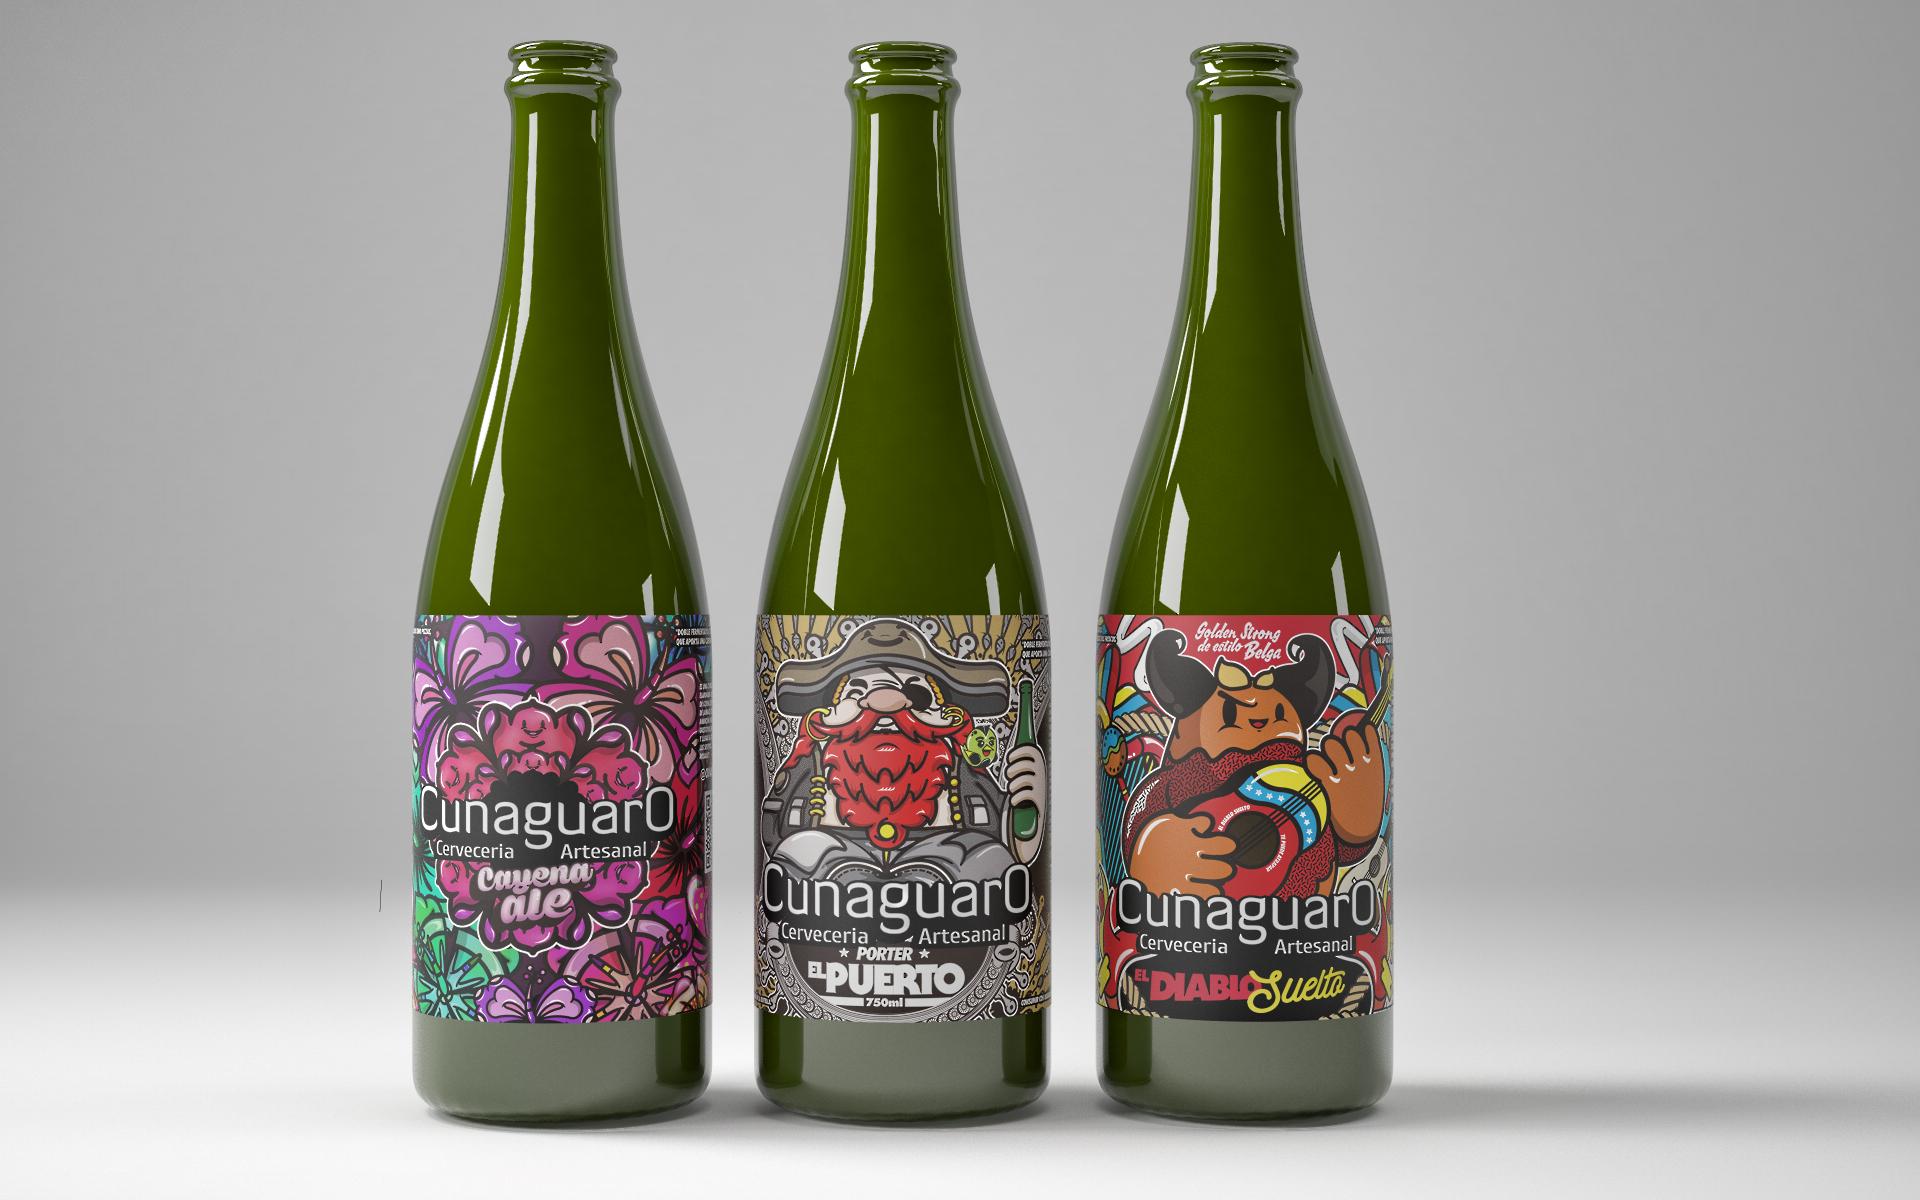 cunaguaro-beer-chocotoy-11.png